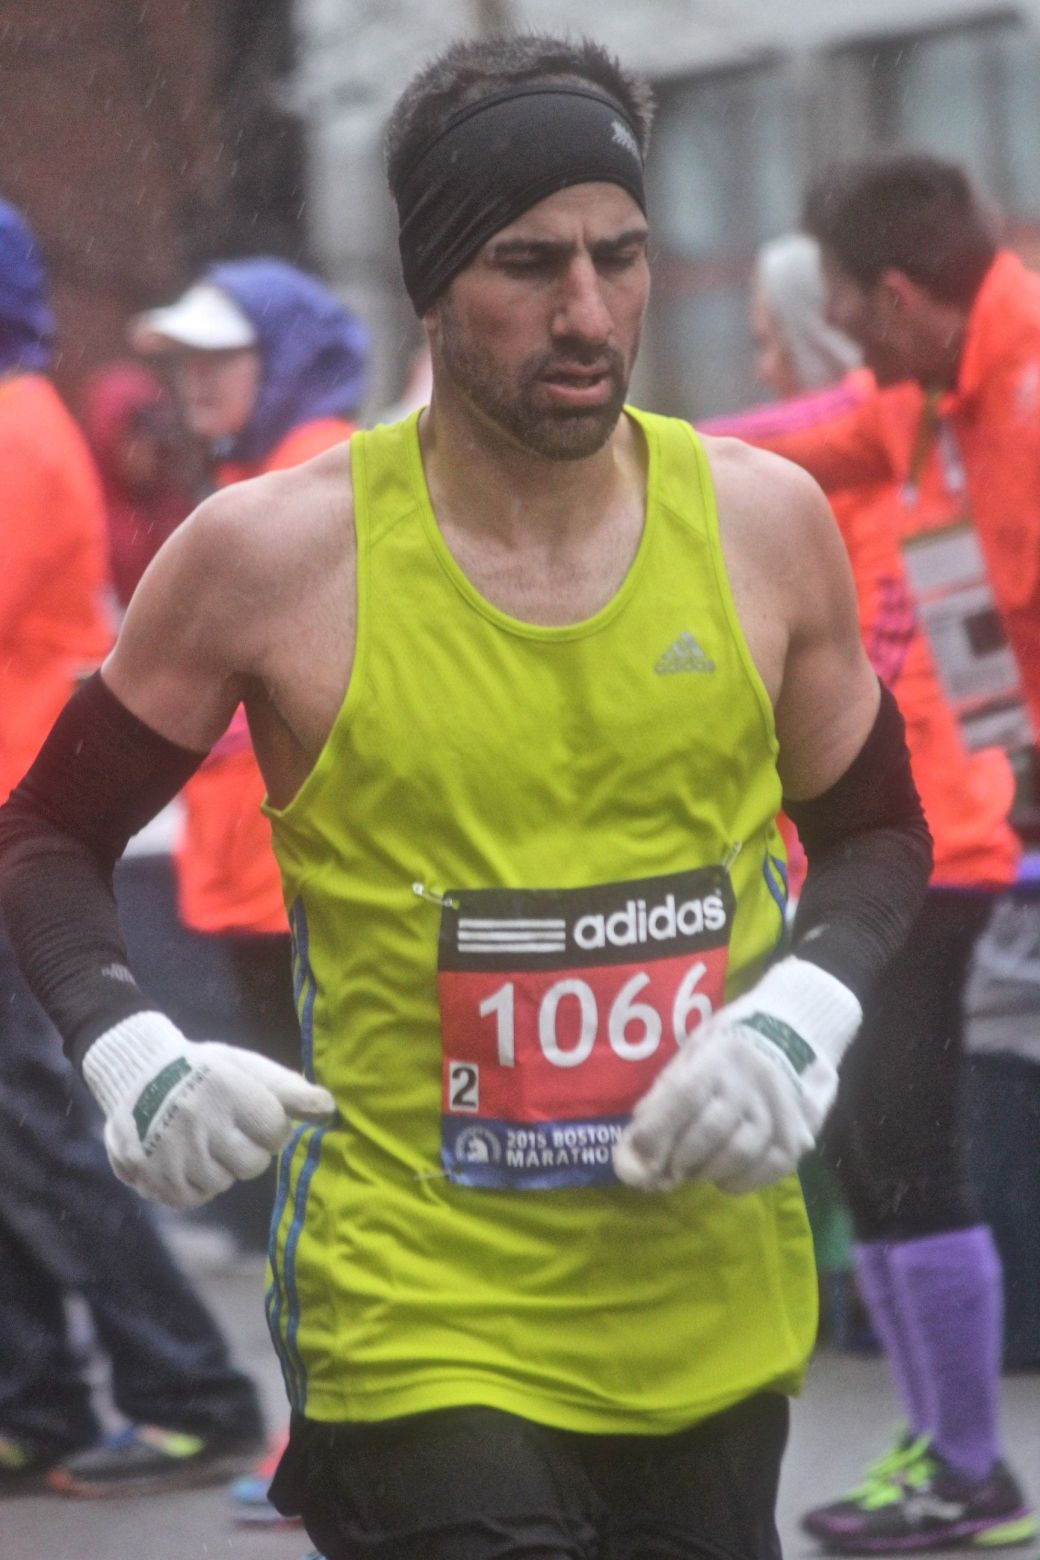 boston marathon april 20 2015 racer number 1066